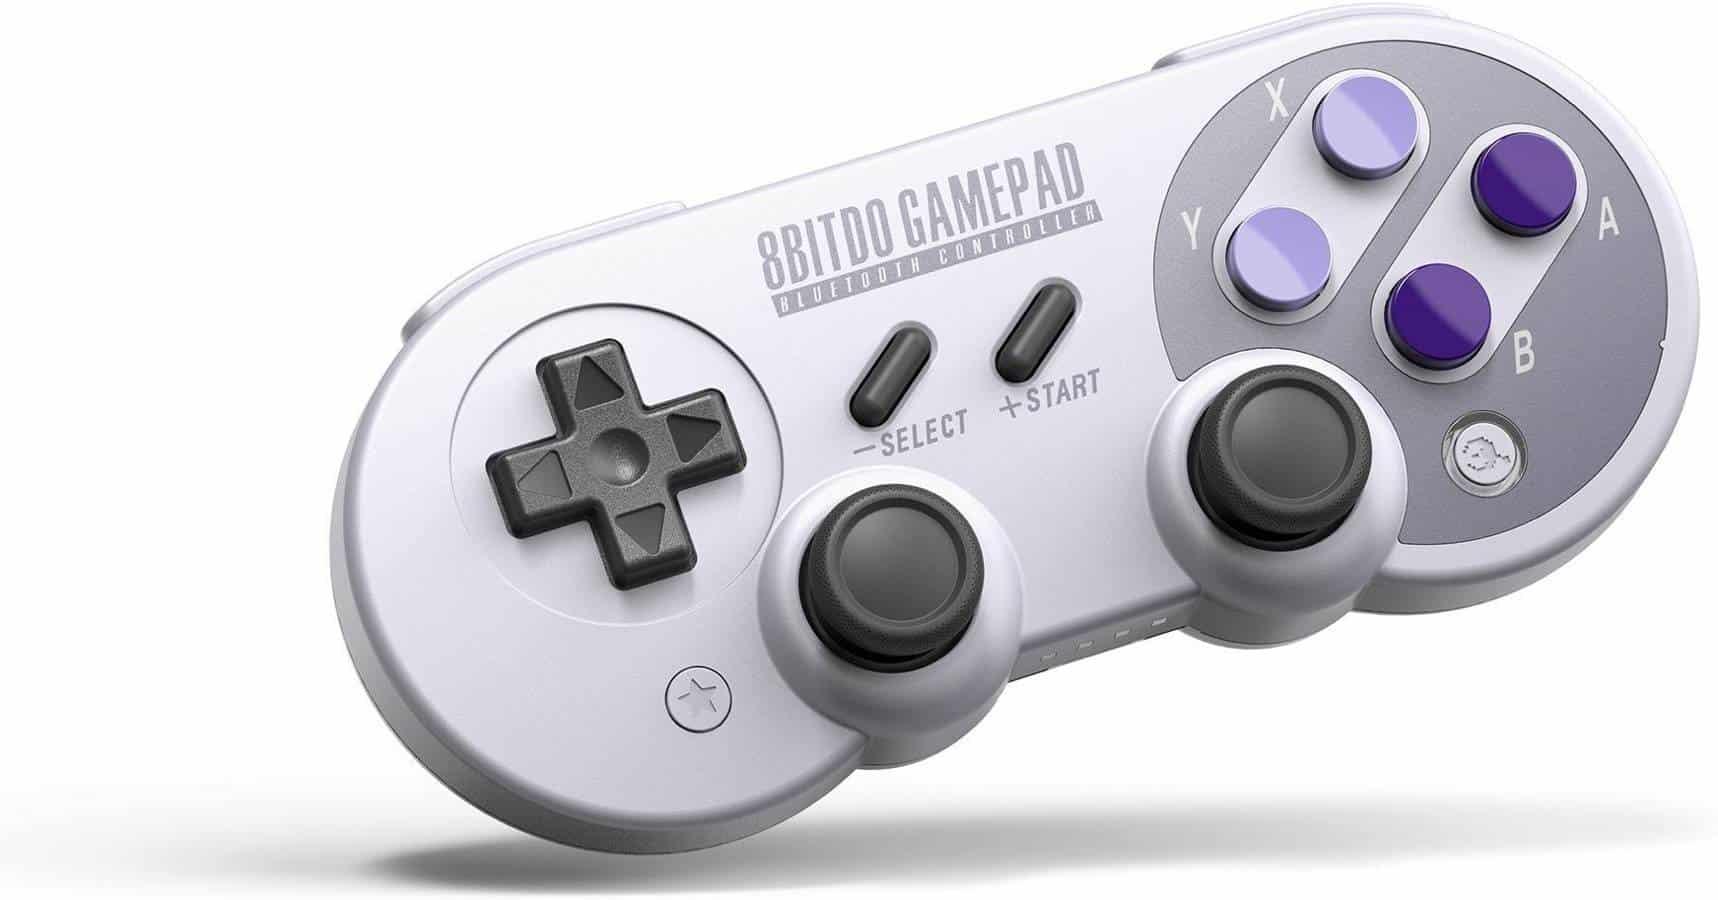 8bitdo gaming gift guide